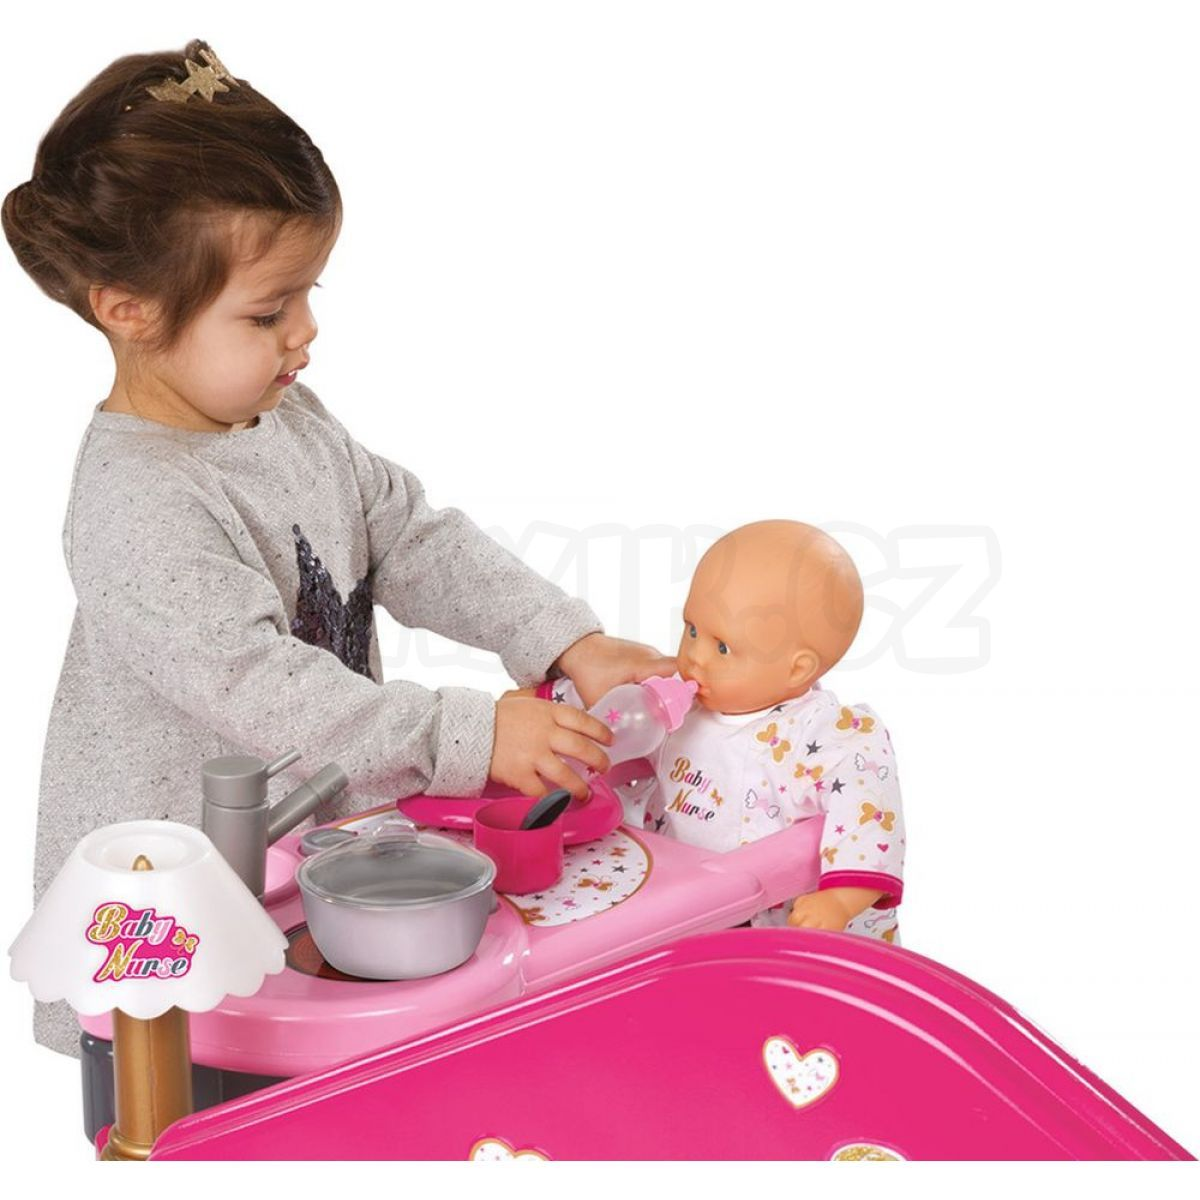 smoby baby nurse dome ek pro panenku max kovy hra ky. Black Bedroom Furniture Sets. Home Design Ideas